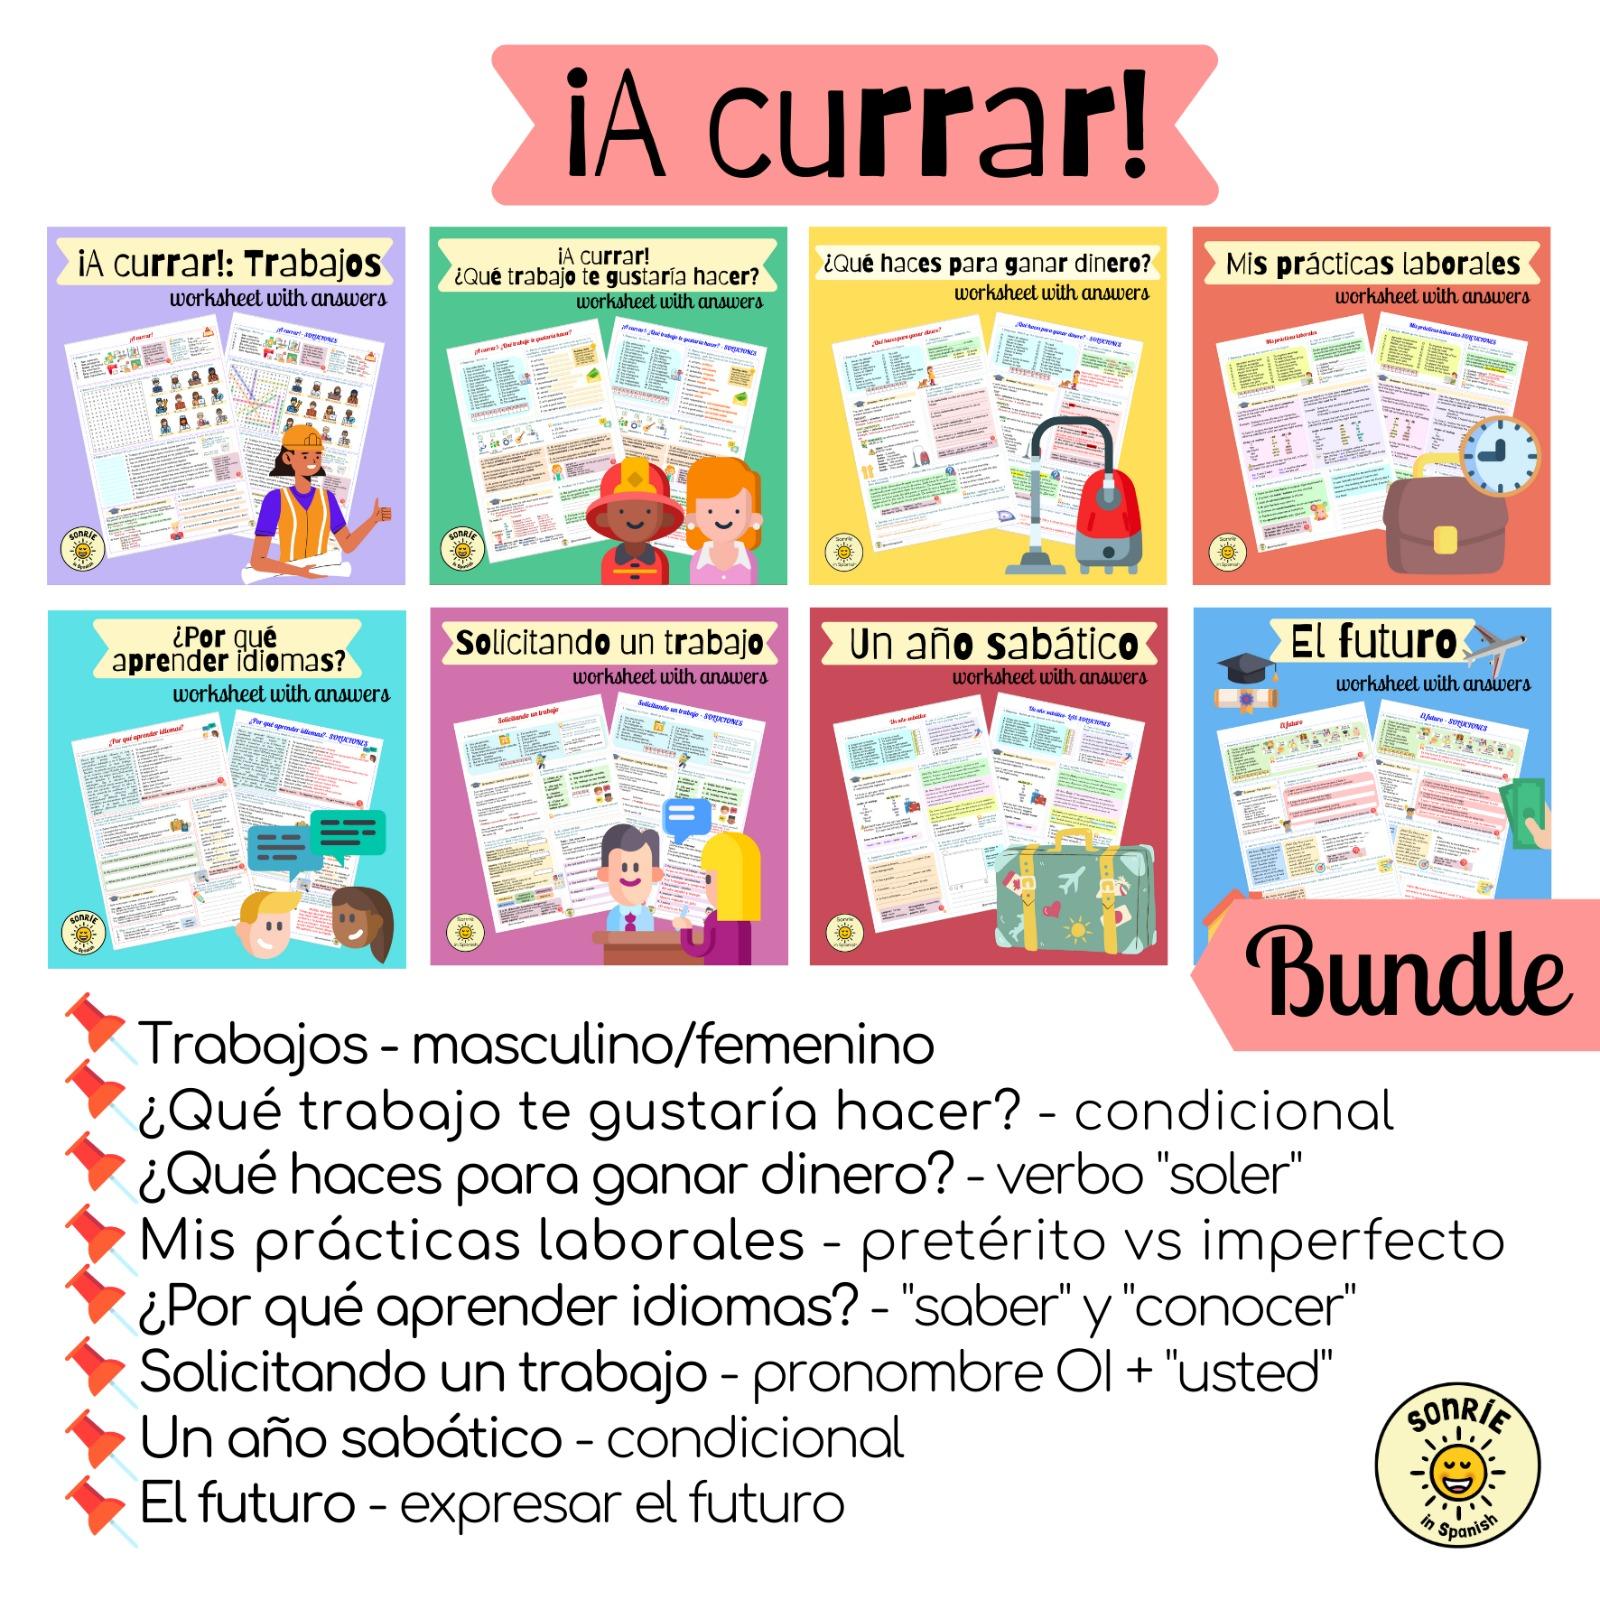 ¡A currar! Pack de fichas con soluciones sobre el tema del trabajo. Spanish GCSE bundle on the world of work. Worksheets with answers